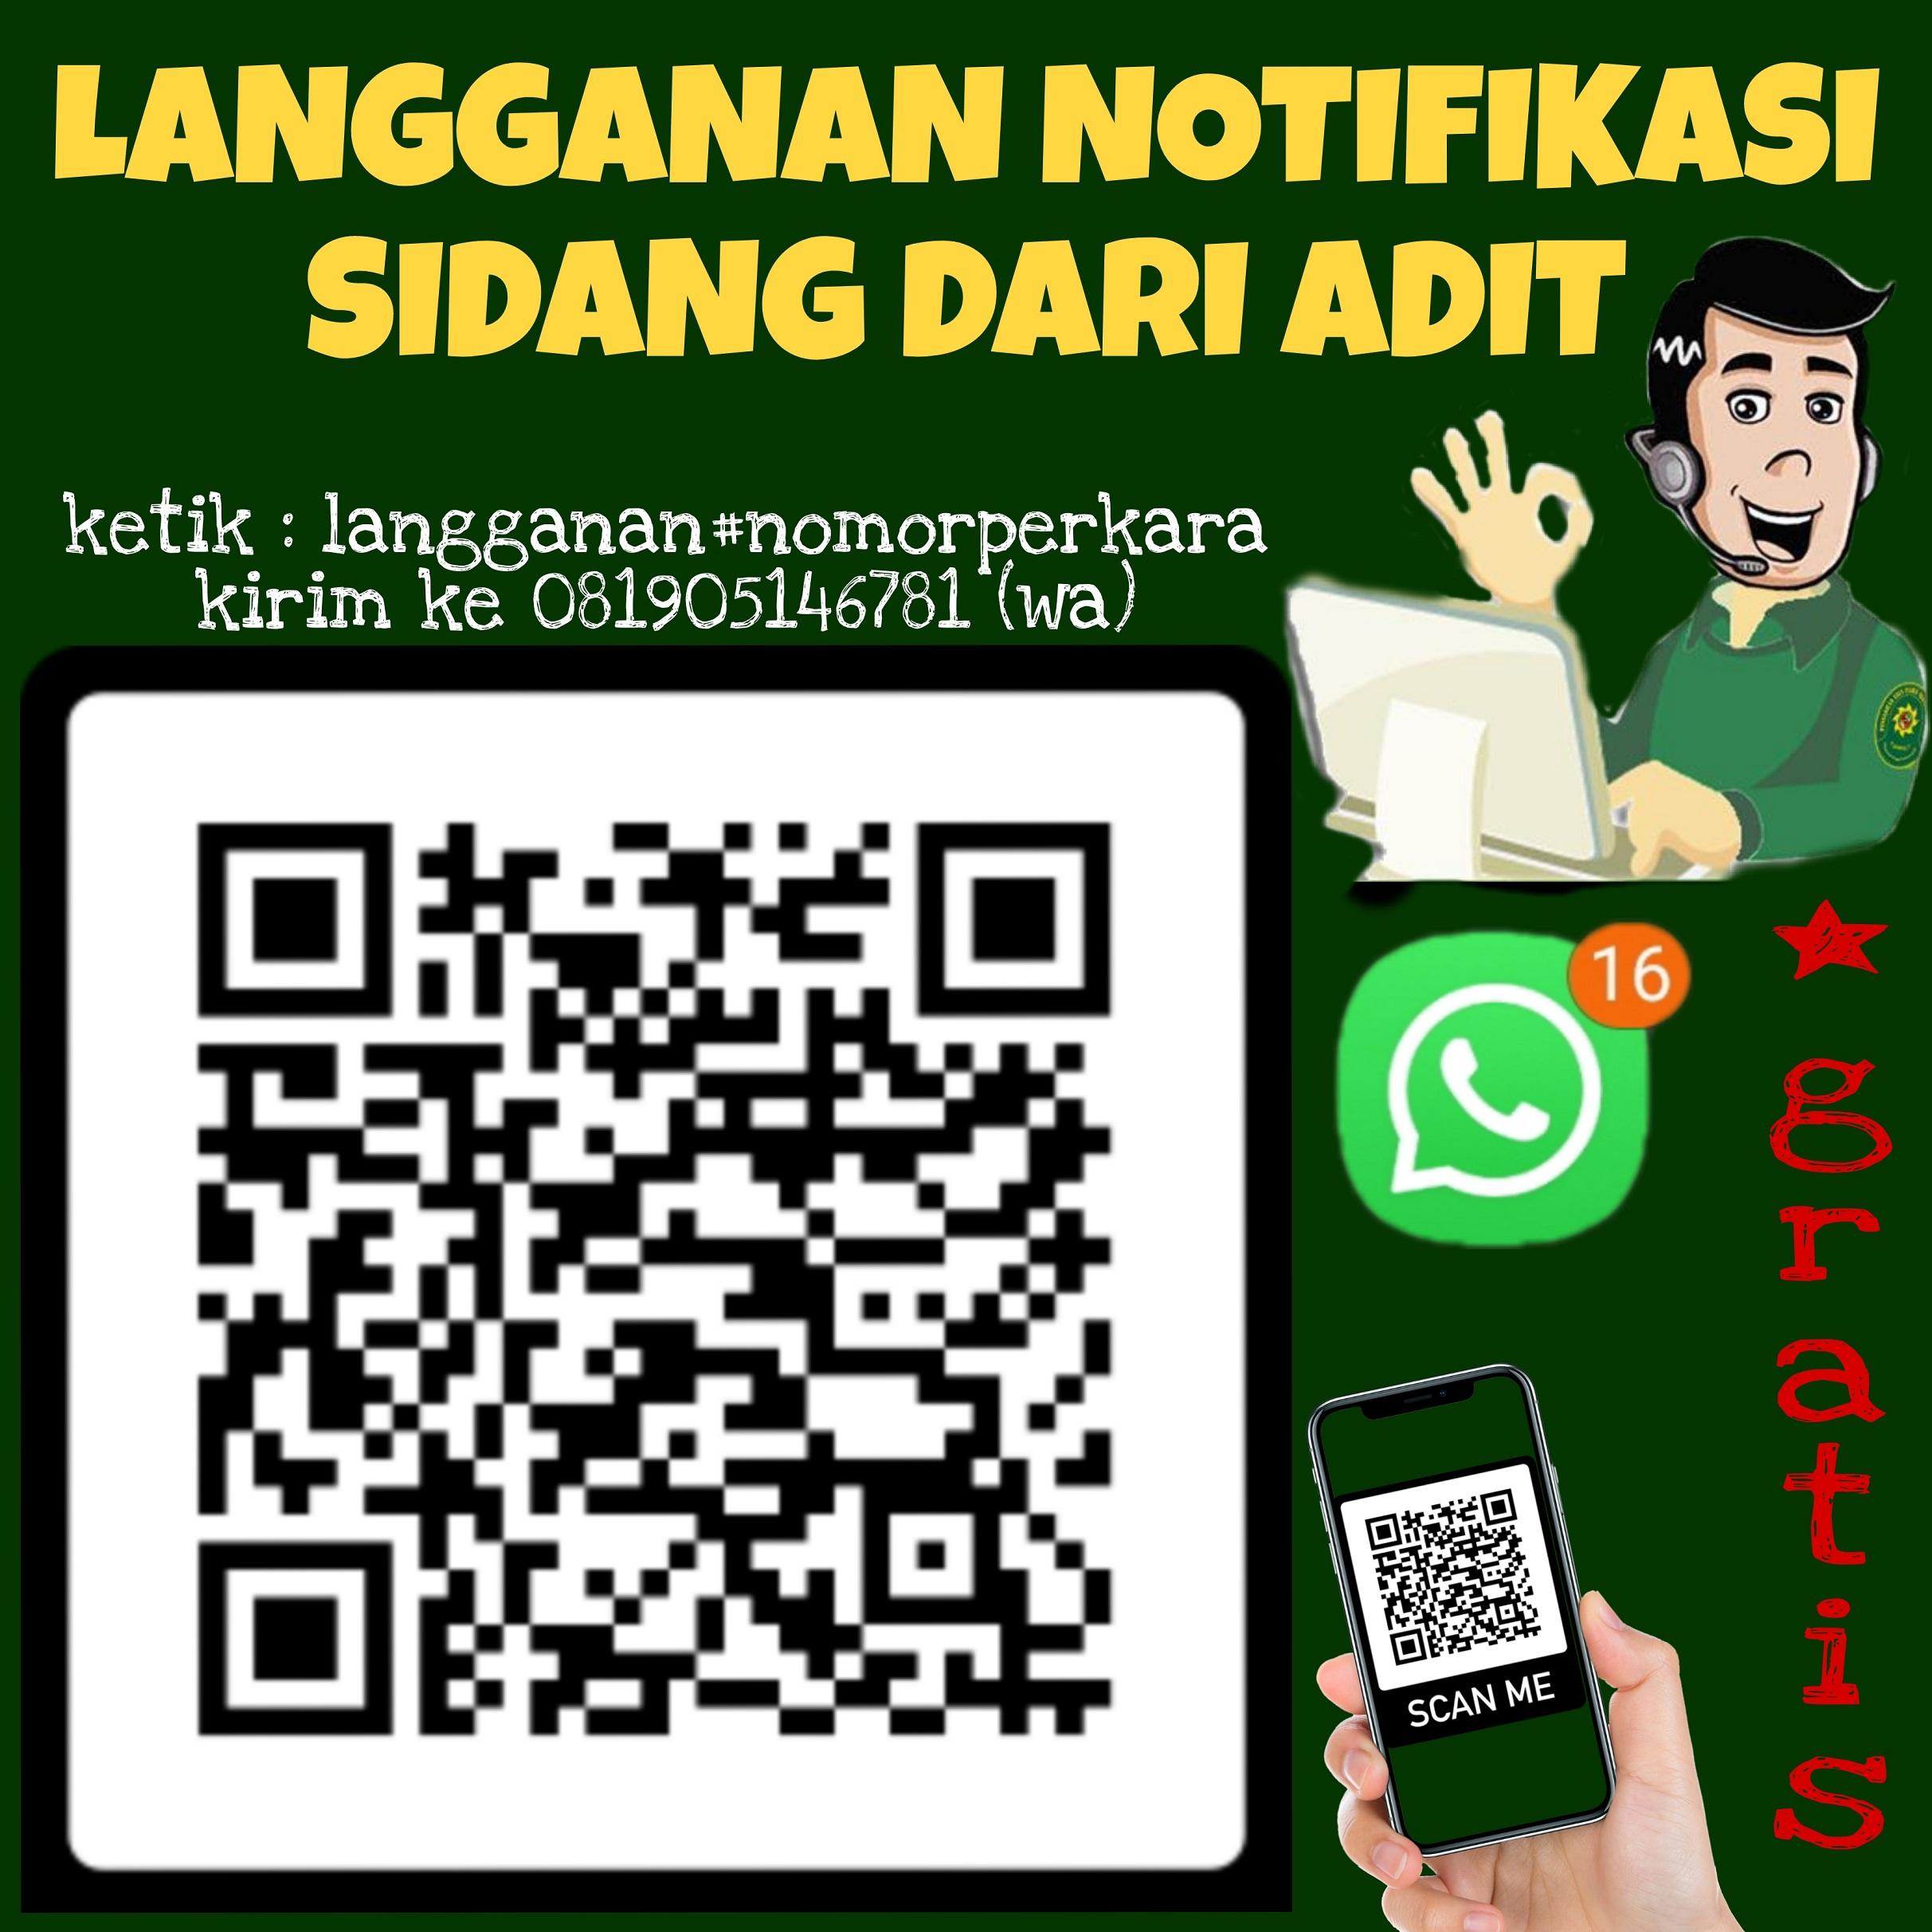 ADiT (Asisten Digital Terintegrasi) PTUN Mataram